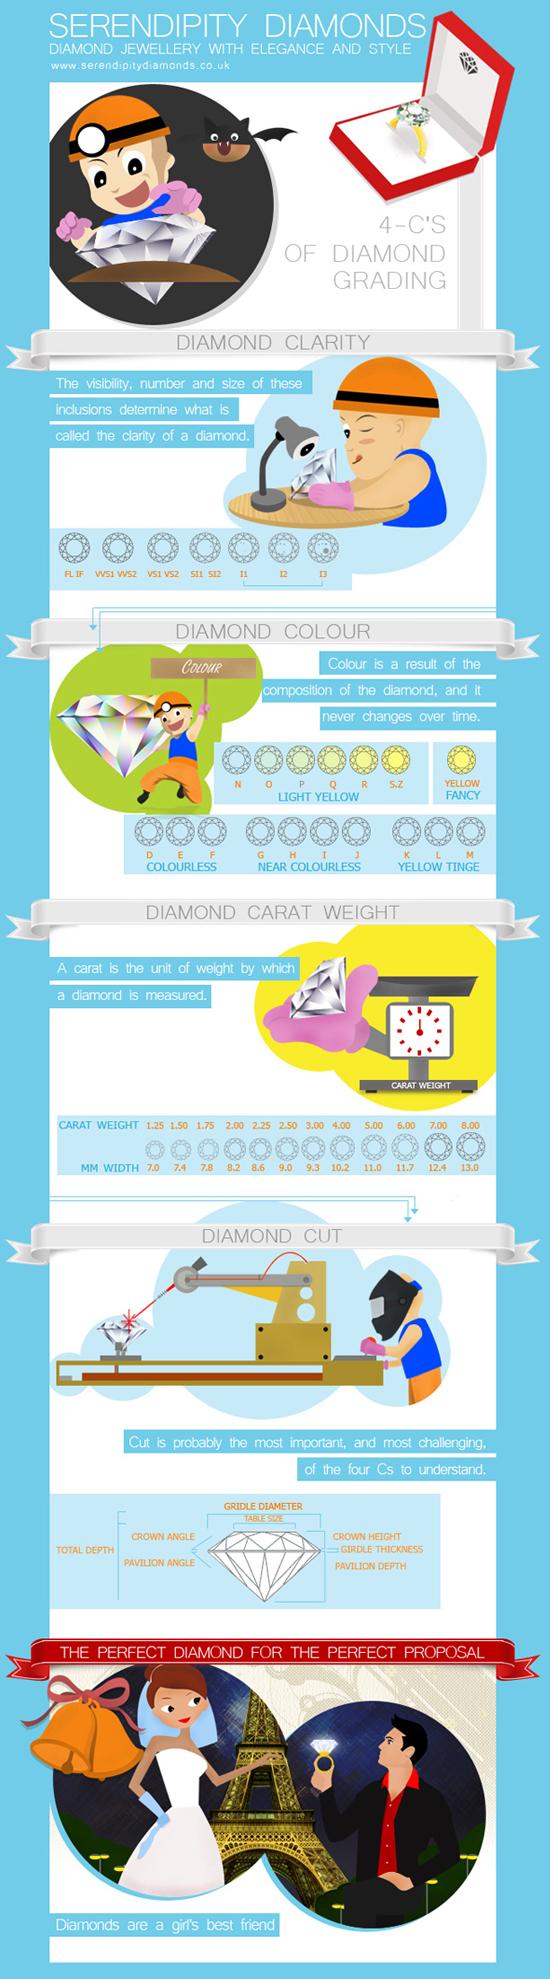 4c's_diamond_grading_illustration